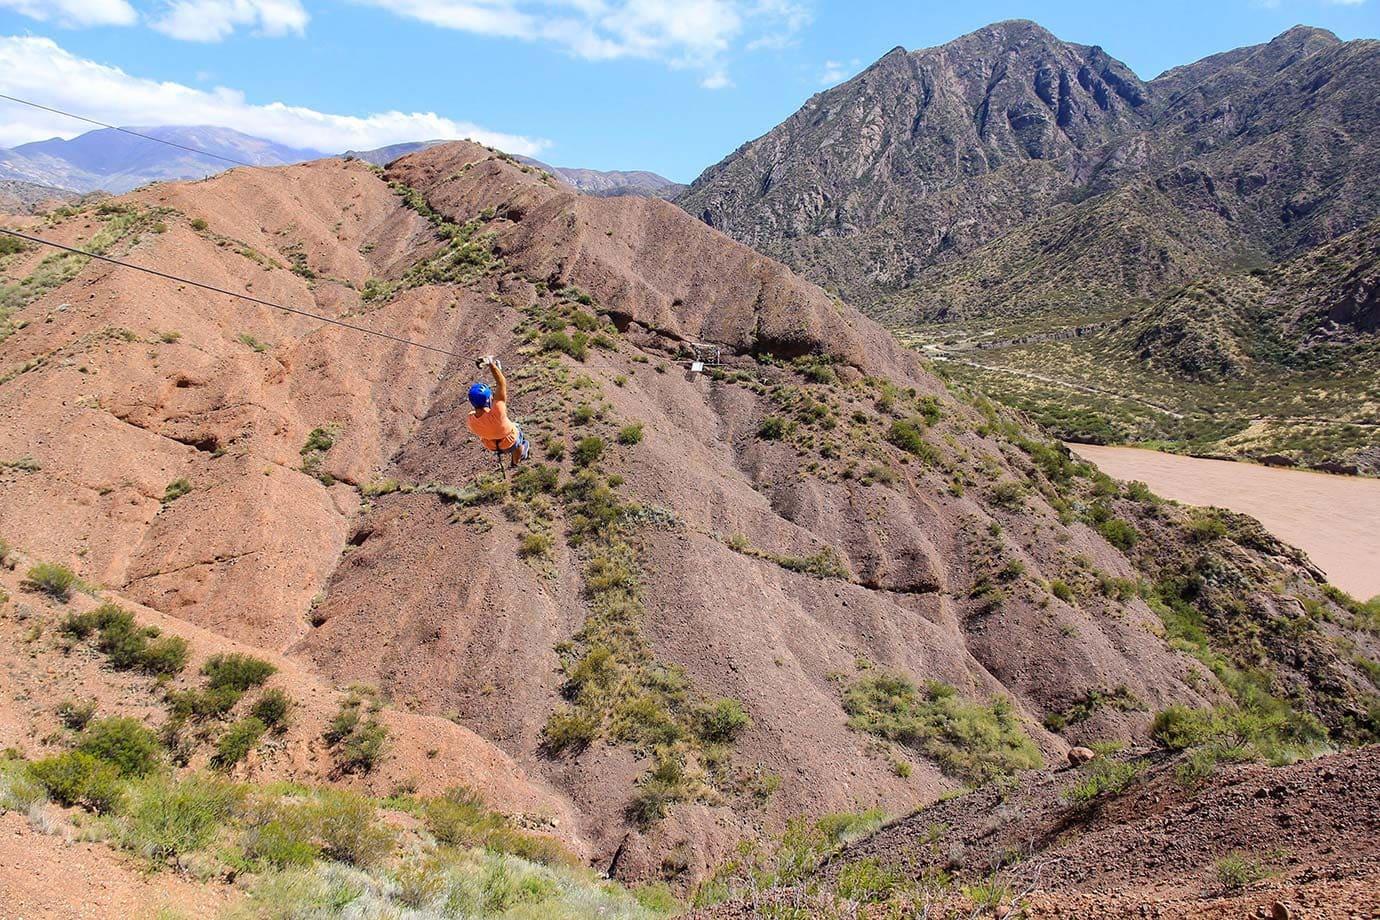 Ziplining with Argentina Rafting Expediciones